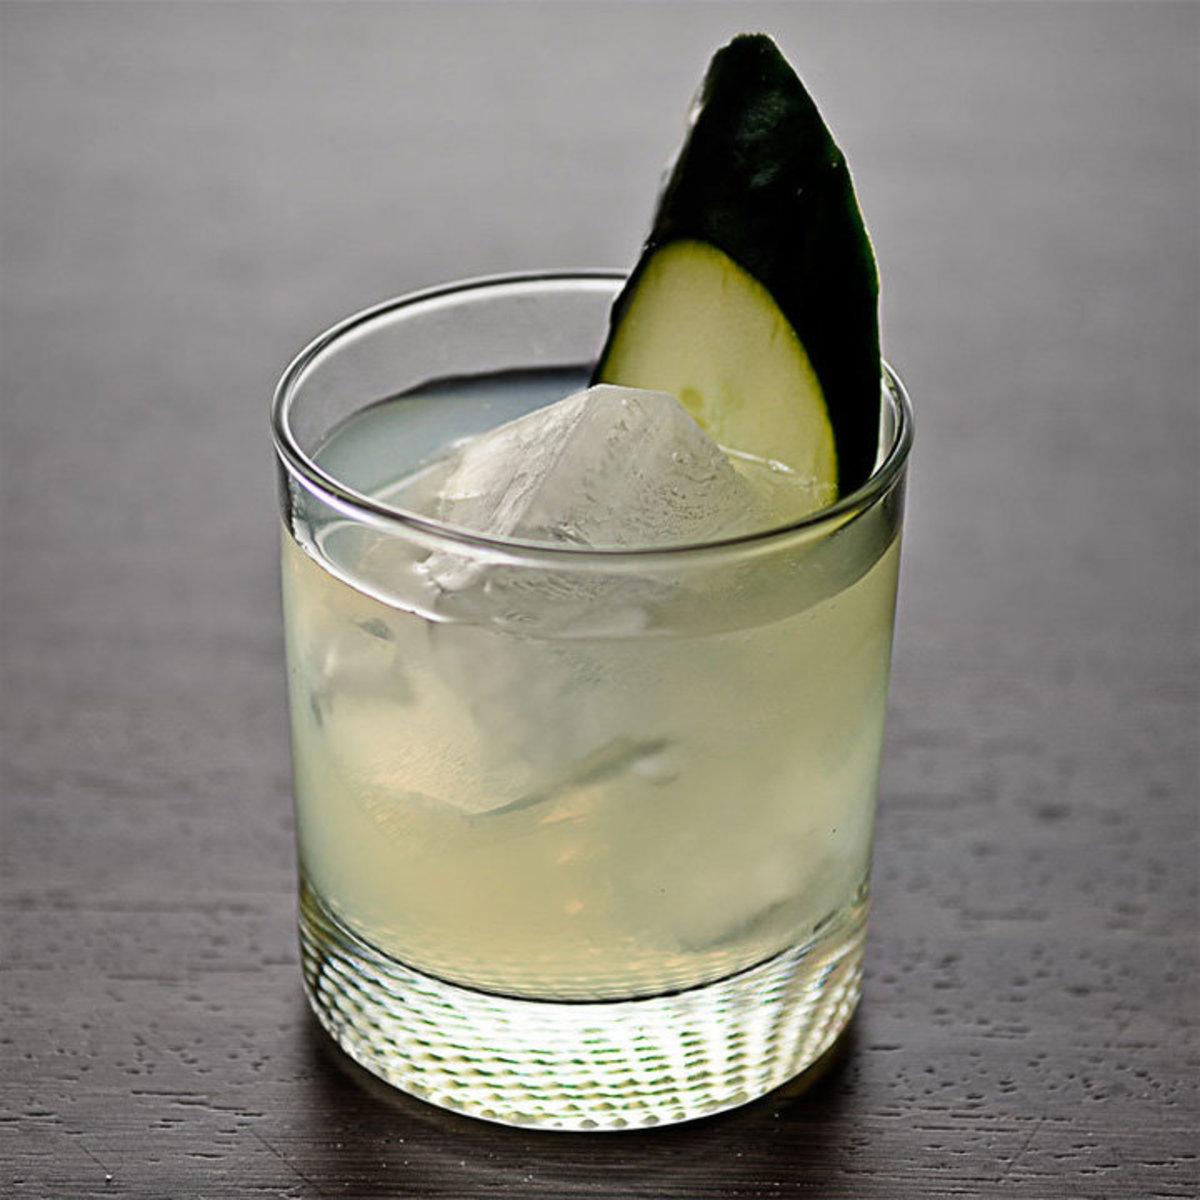 cucumber-basil-lime-gimlet-720-720-recipe